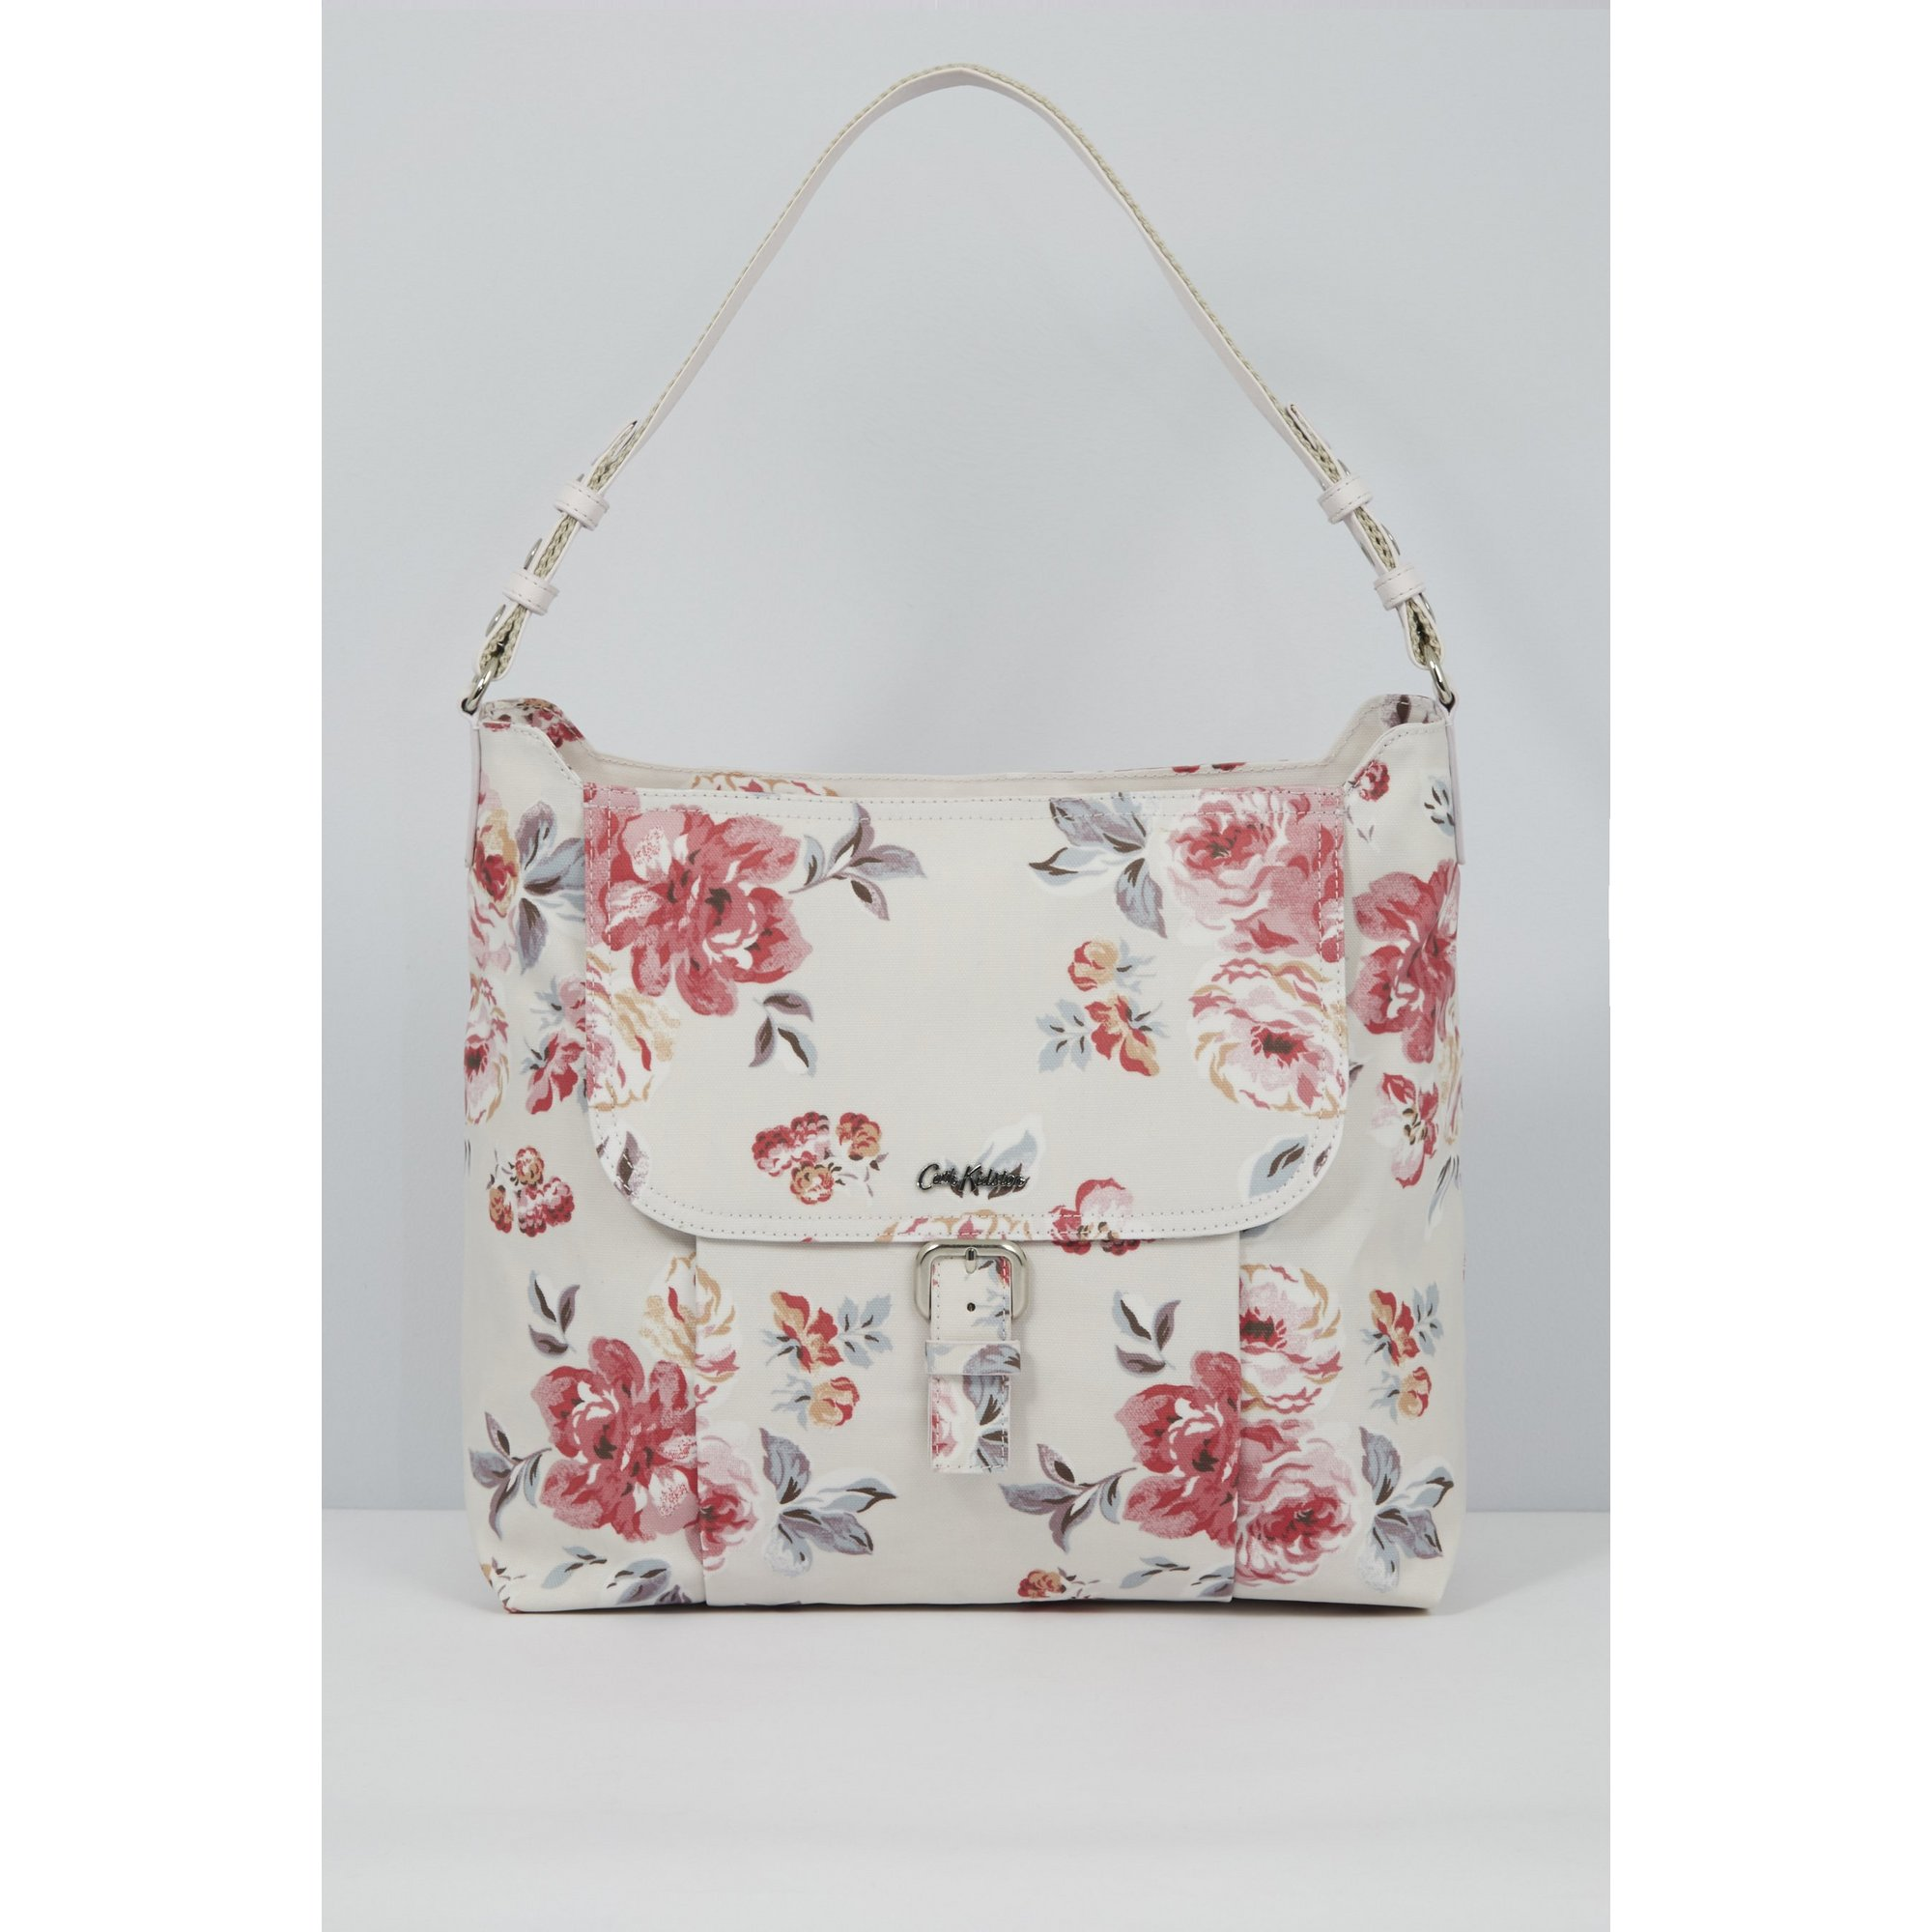 Image of Cath Kidston Brampton Bunch Shoulder Bag